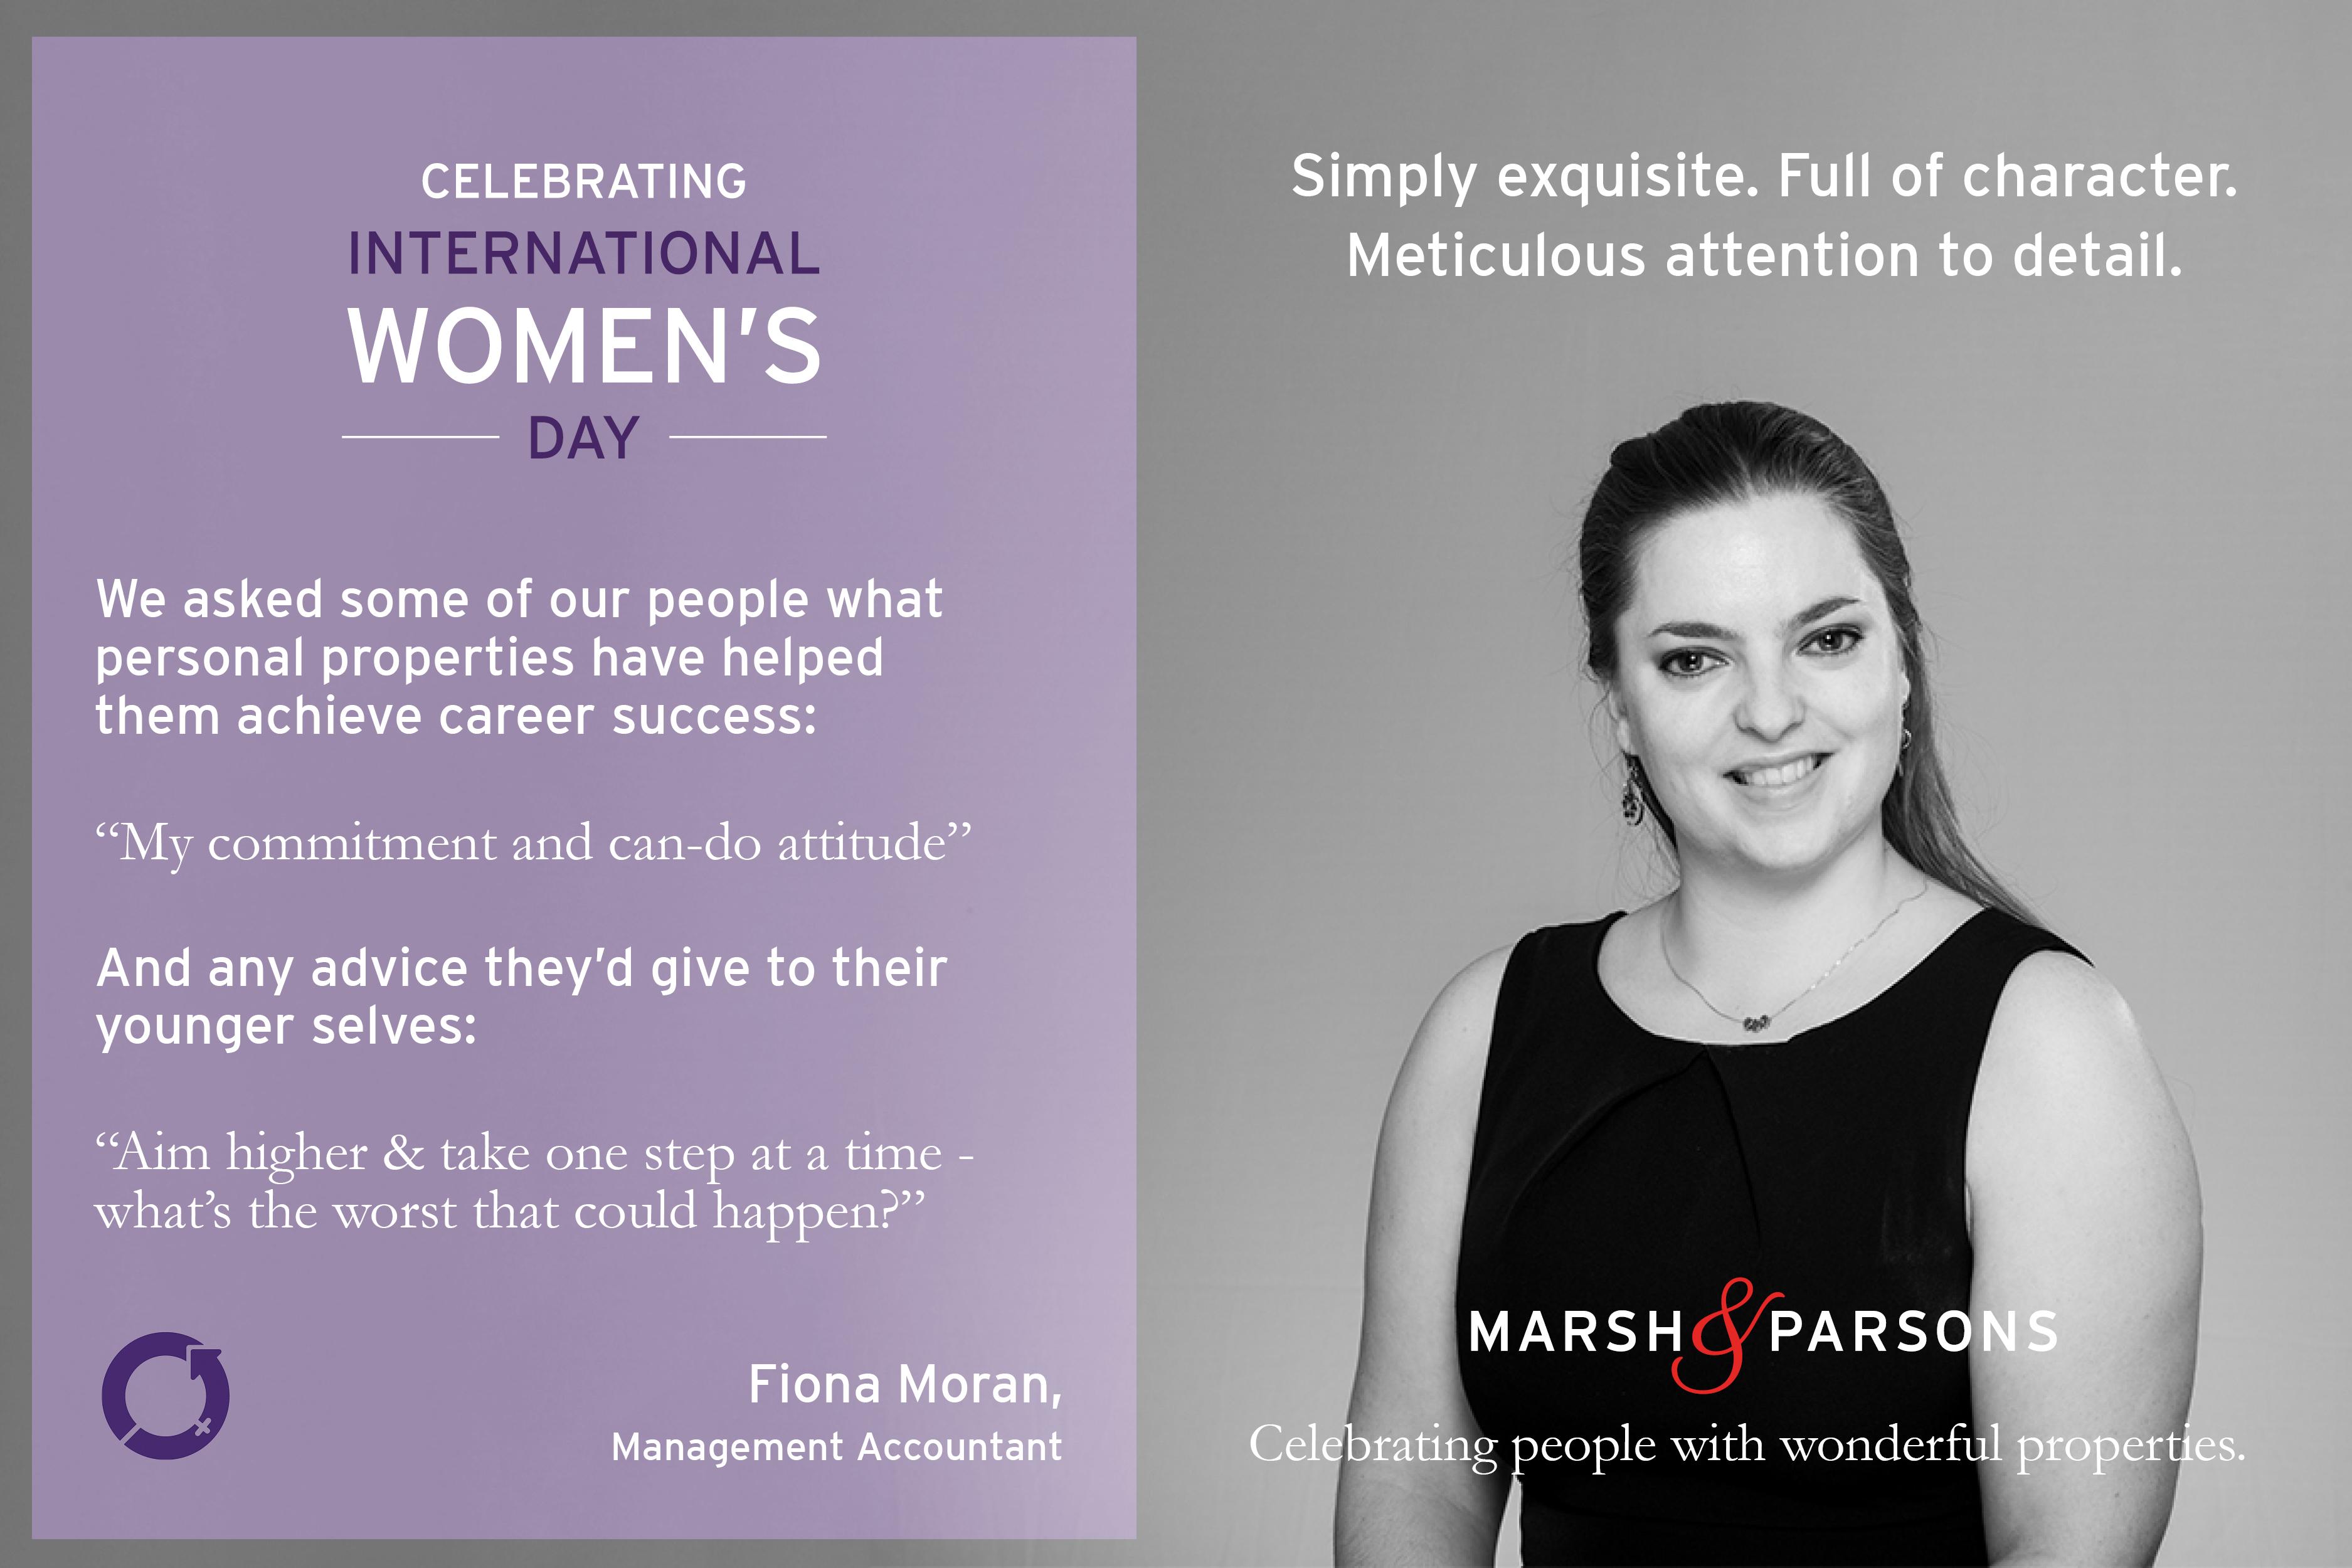 Fiona Moran, International Women's Day